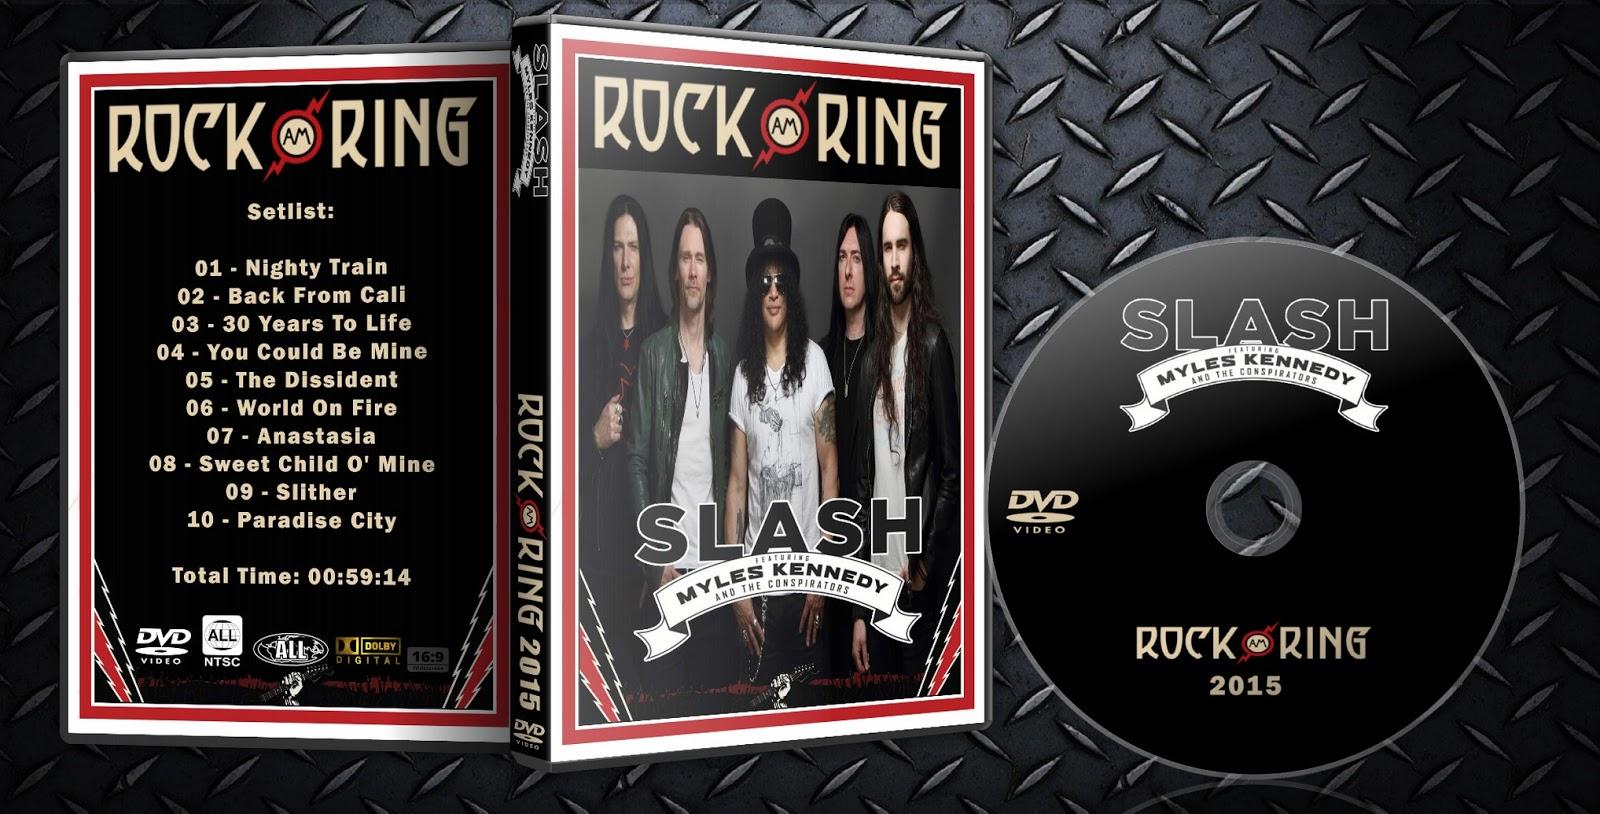 Deer5001rockcocert Slash 2015 Rock Am Ring Hdtv